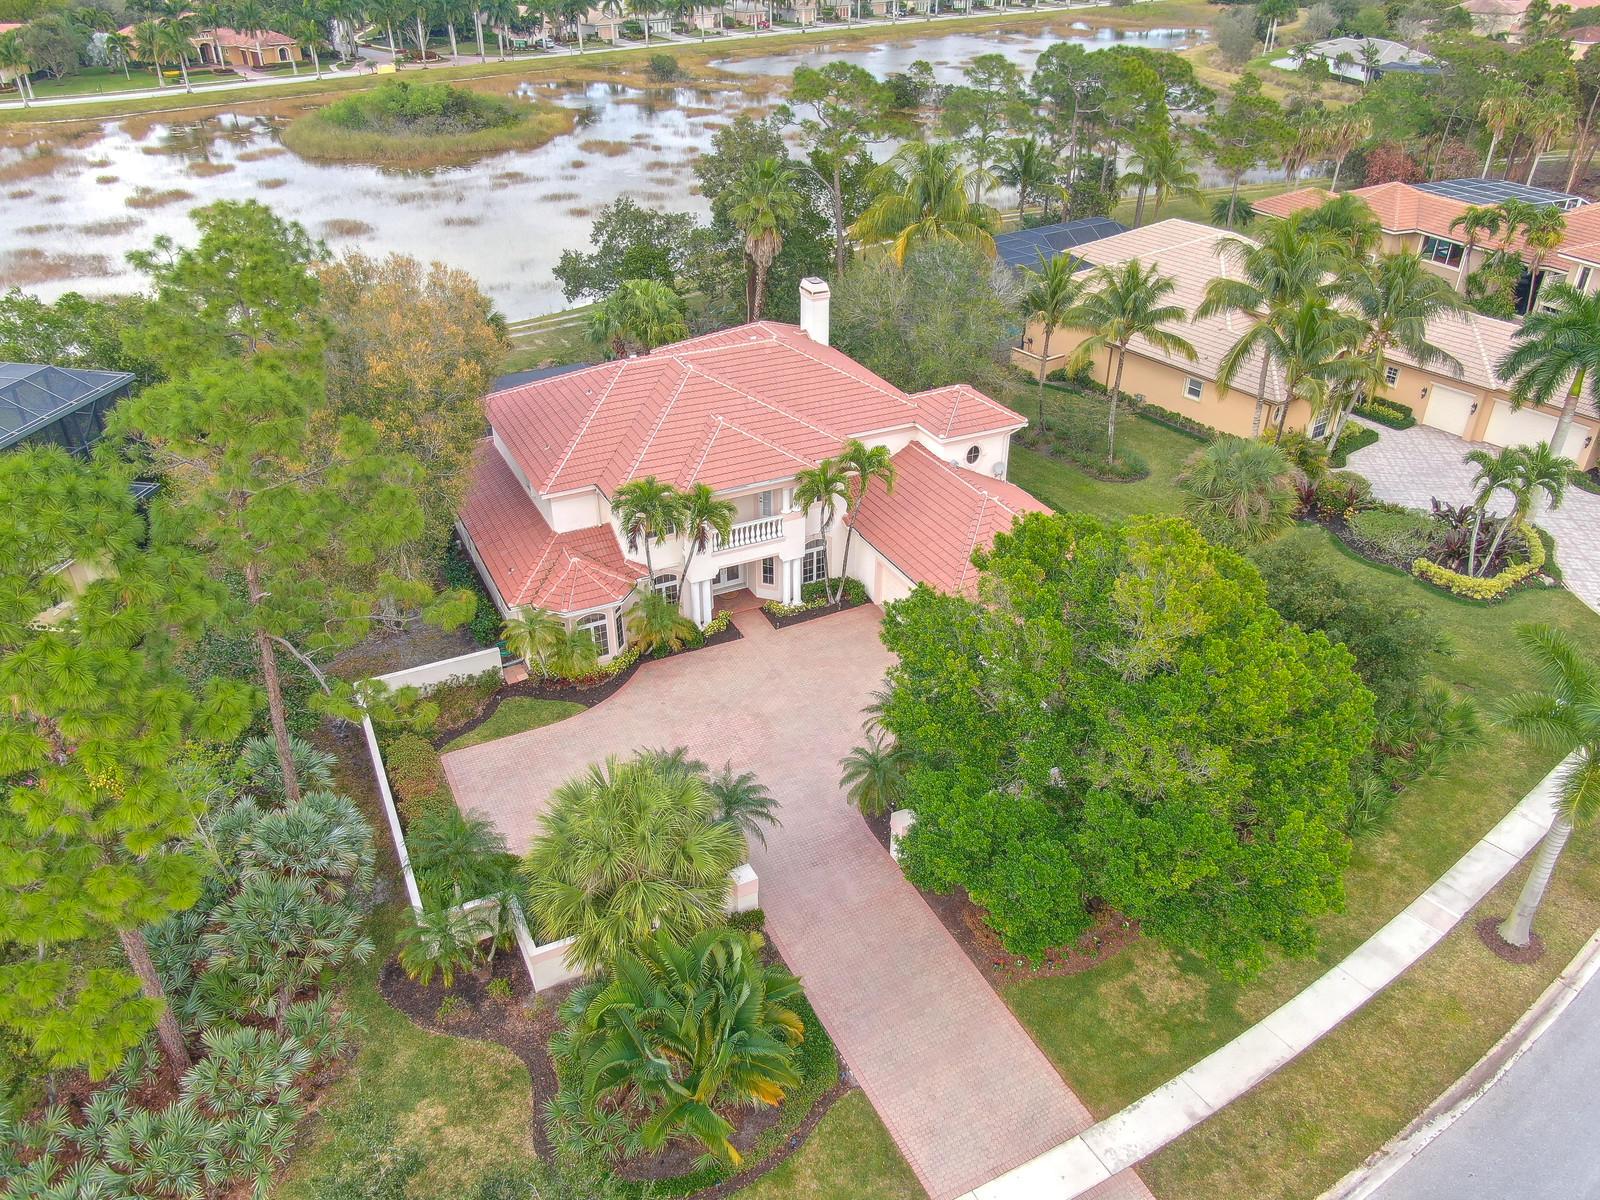 6640 Audubon Trce Trace, West Palm Beach, Florida 33412, 4 Bedrooms Bedrooms, ,4 BathroomsBathrooms,A,Single family,Audubon Trce,RX-10600383